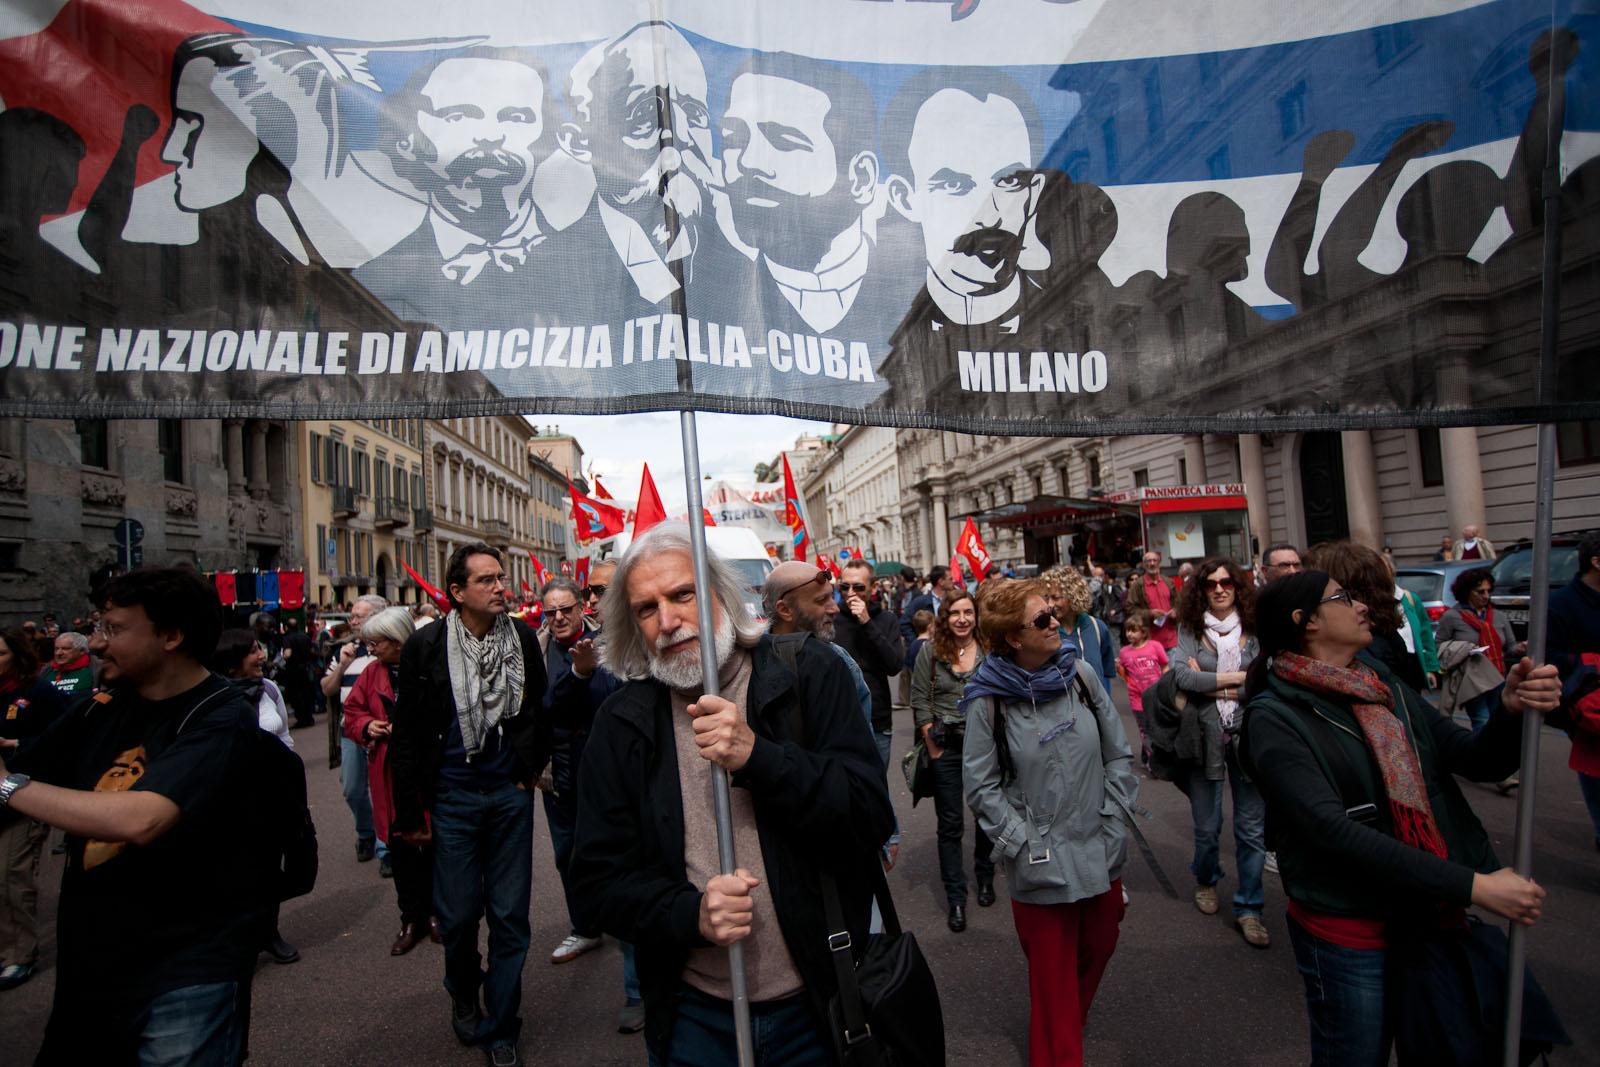 10 - Italia & Cuba Friends